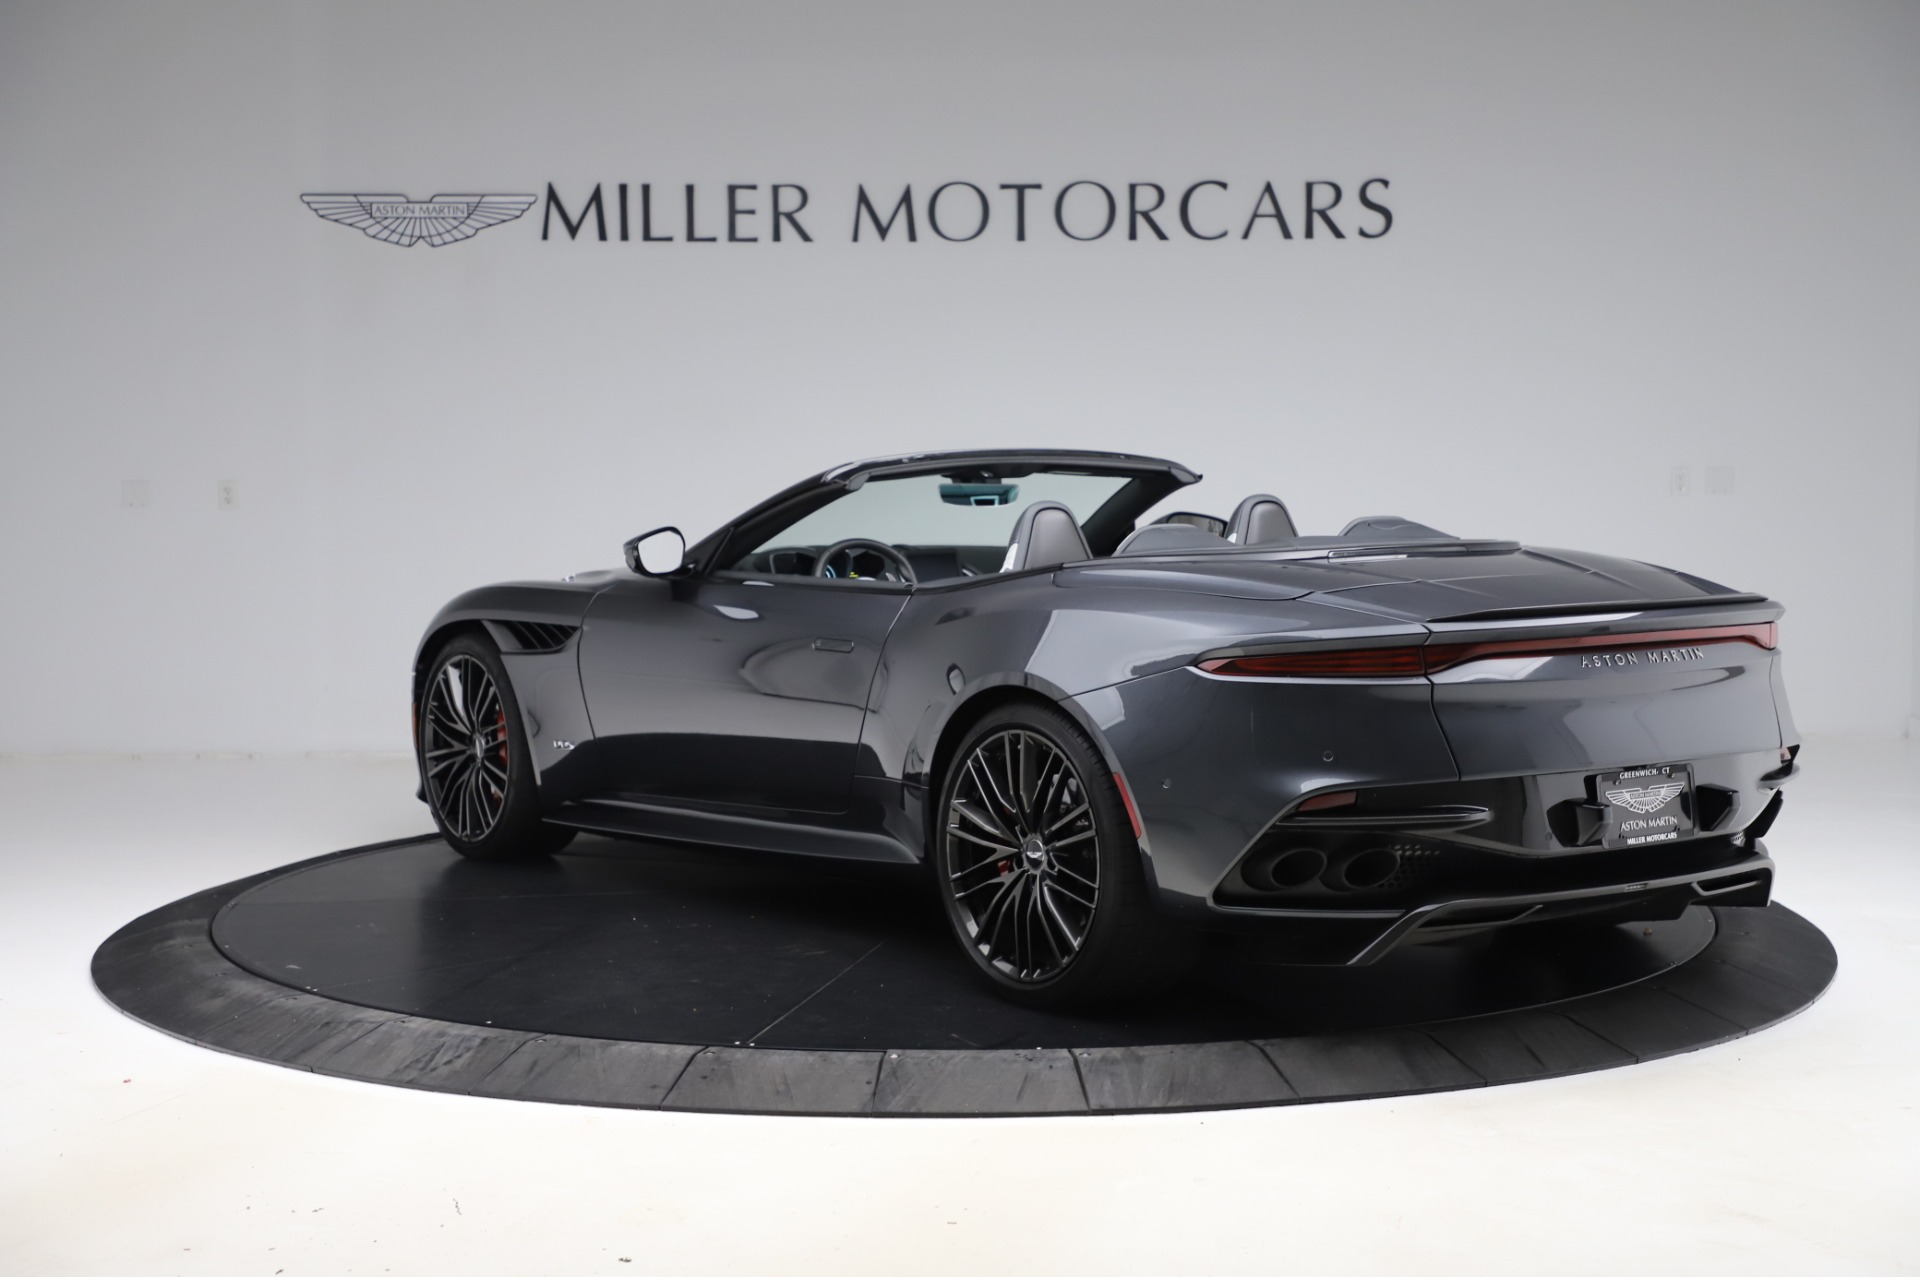 Pre Owned 2020 Aston Martin Dbs Superleggera Volante For Sale Special Pricing Mclaren Greenwich Stock A1505